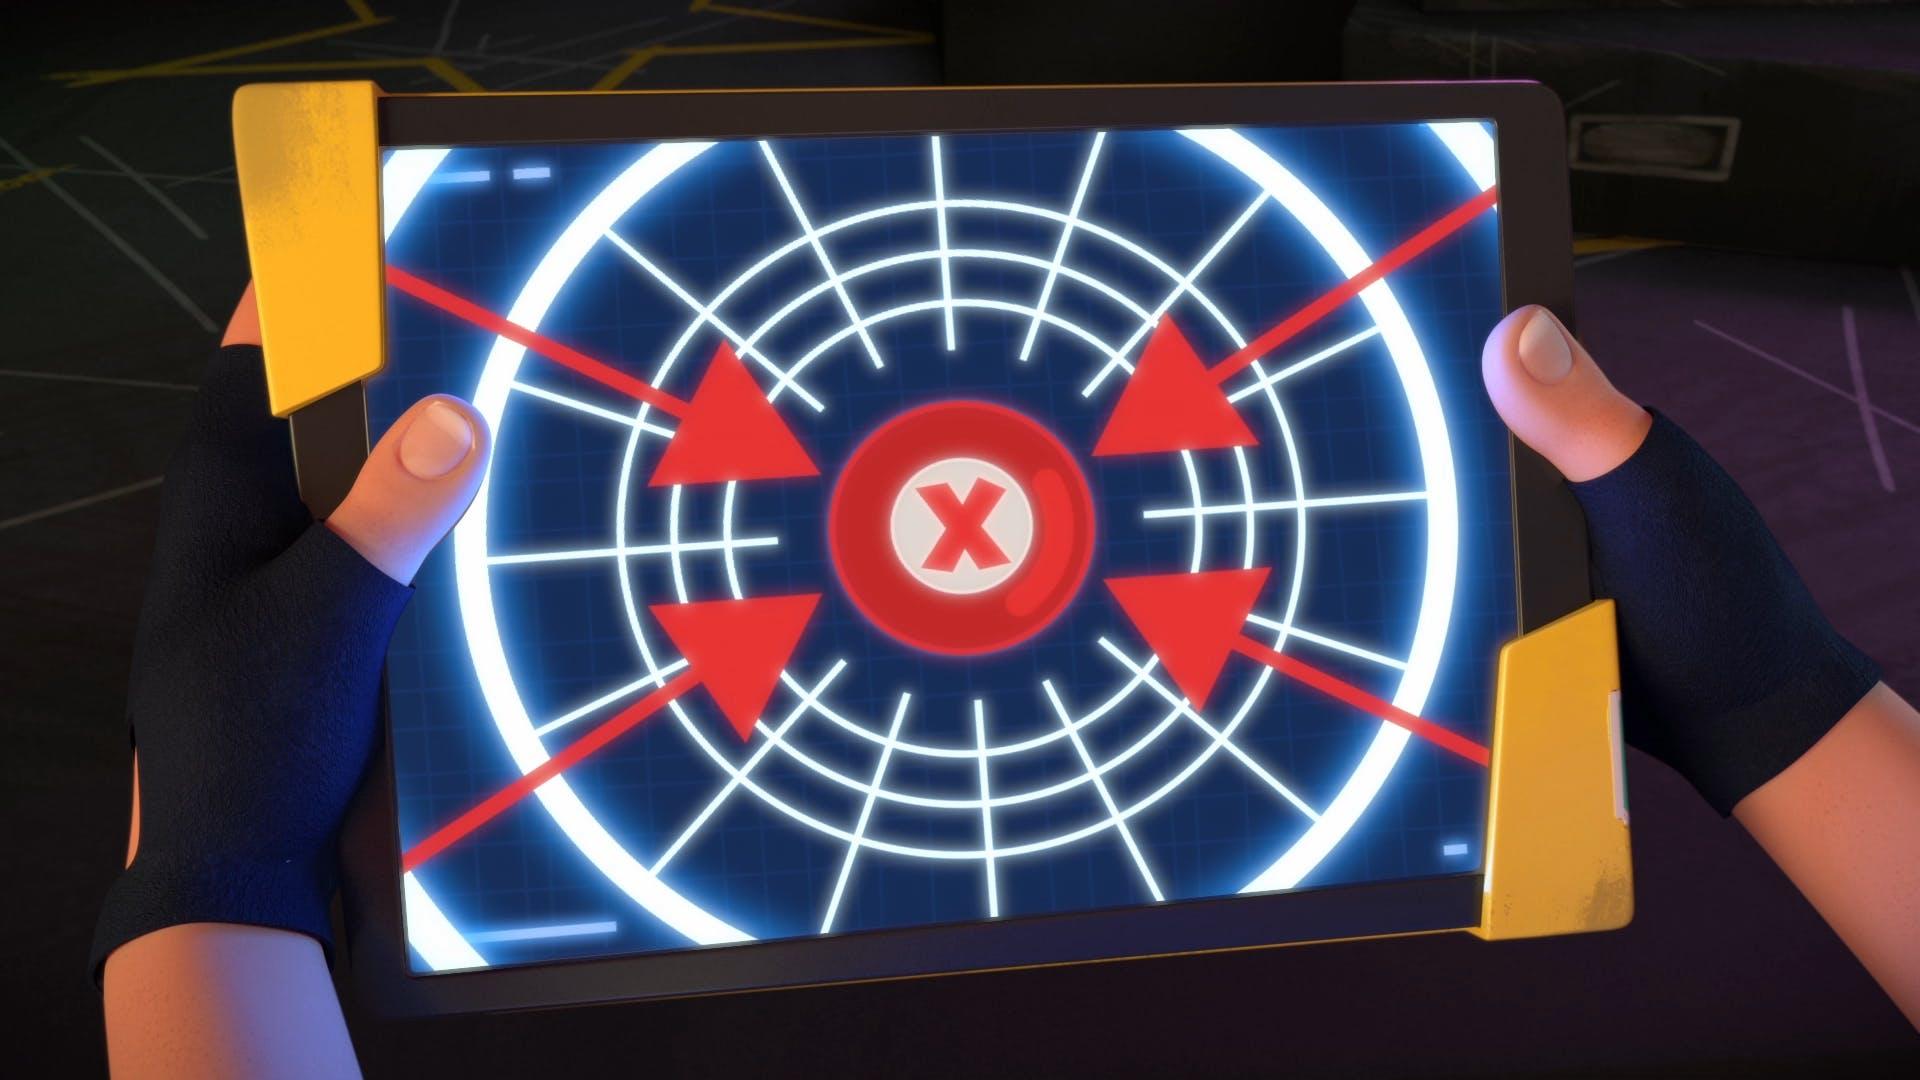 Rubi's tablet shows secret Star Wars style schematic